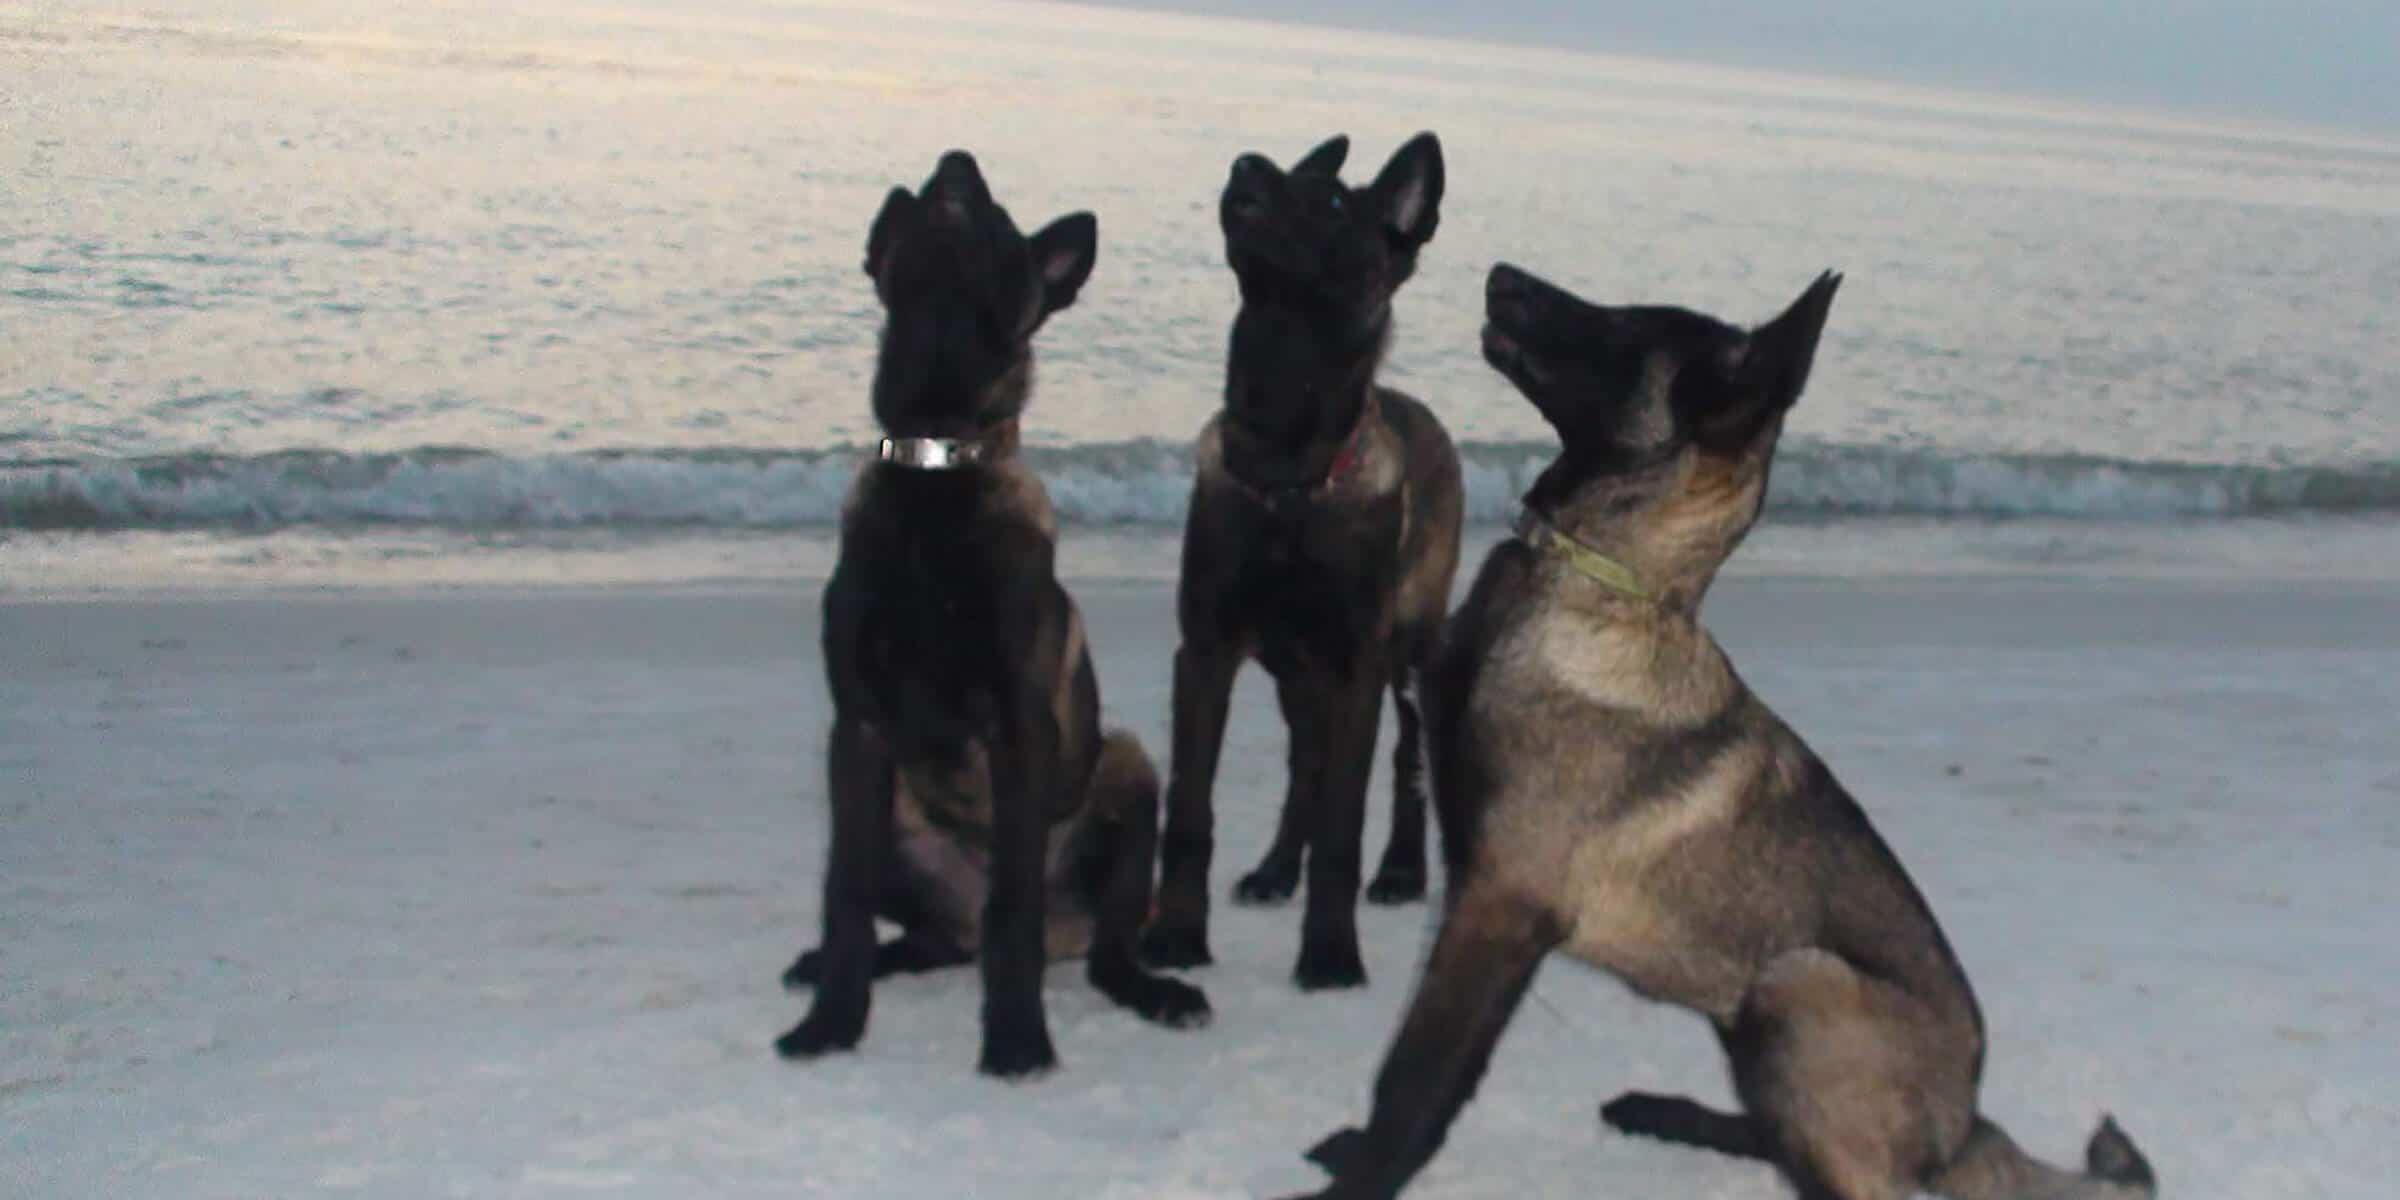 Malinois Puppies Sitting on a Beach